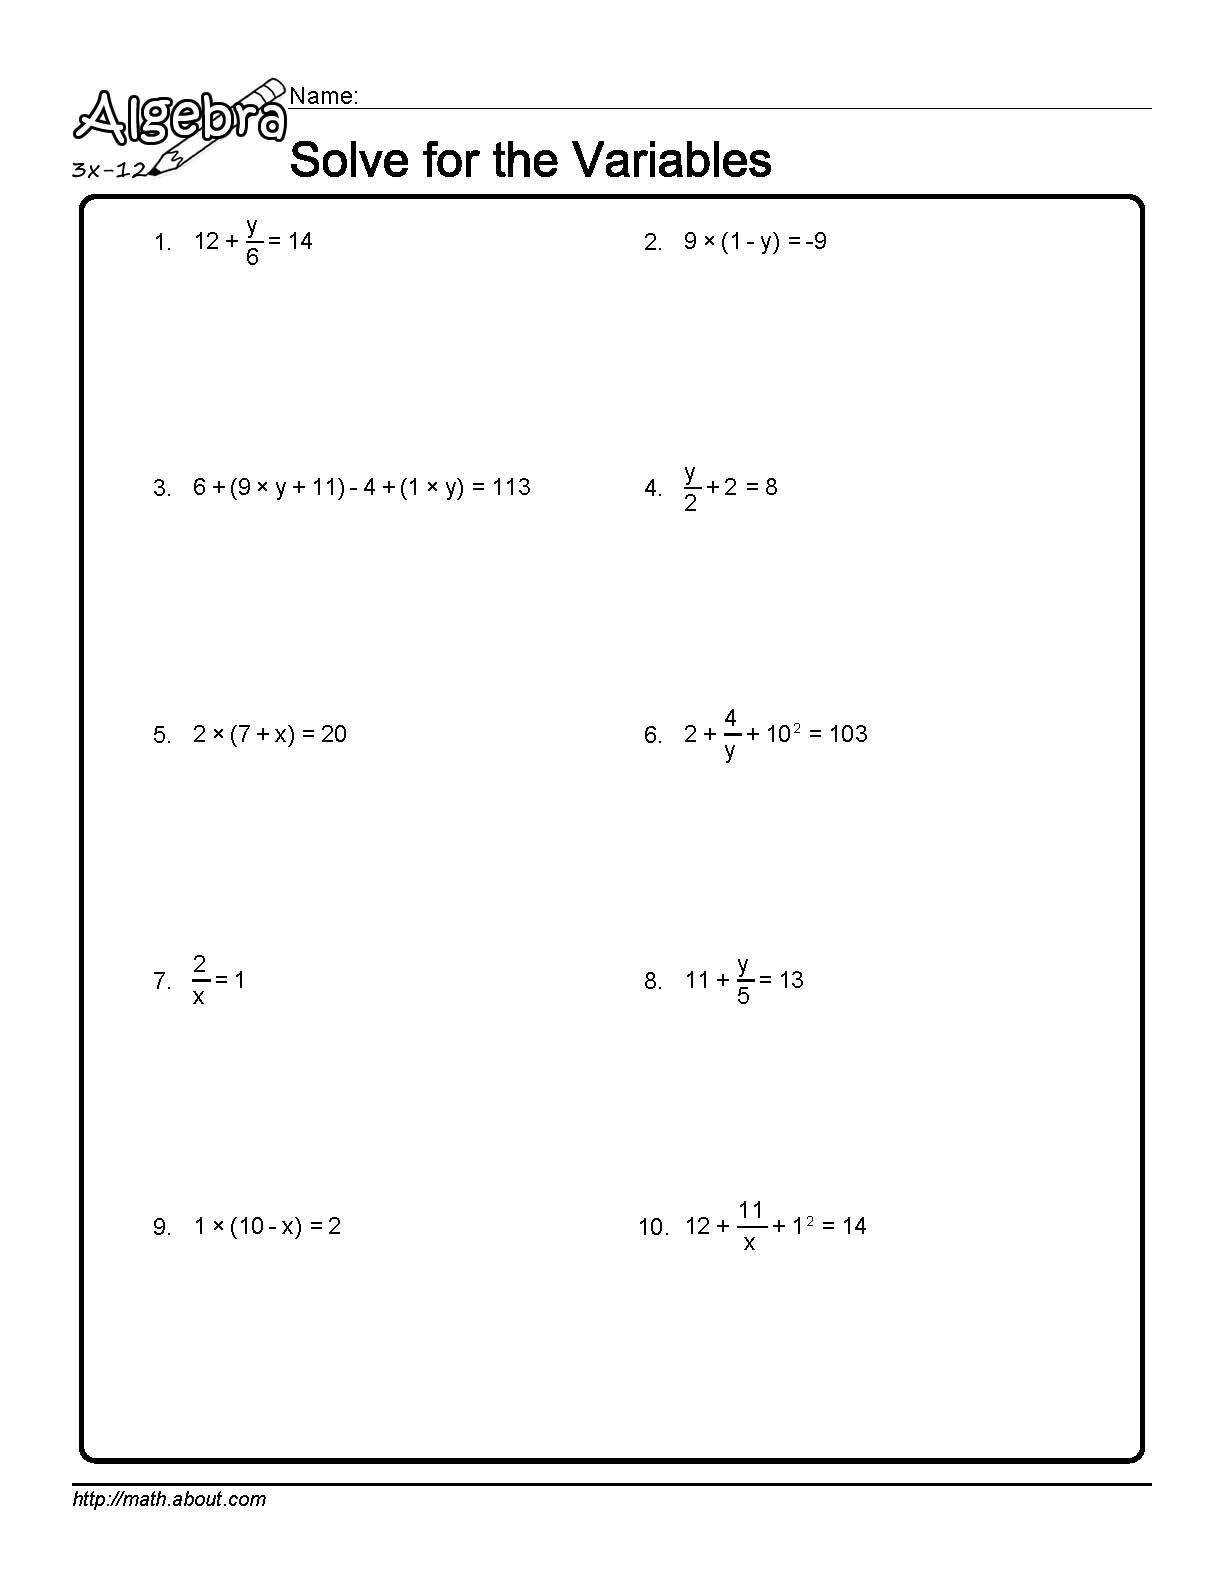 worksheet Solving For Variables Worksheet solve for the variables worksheet 1 of 10